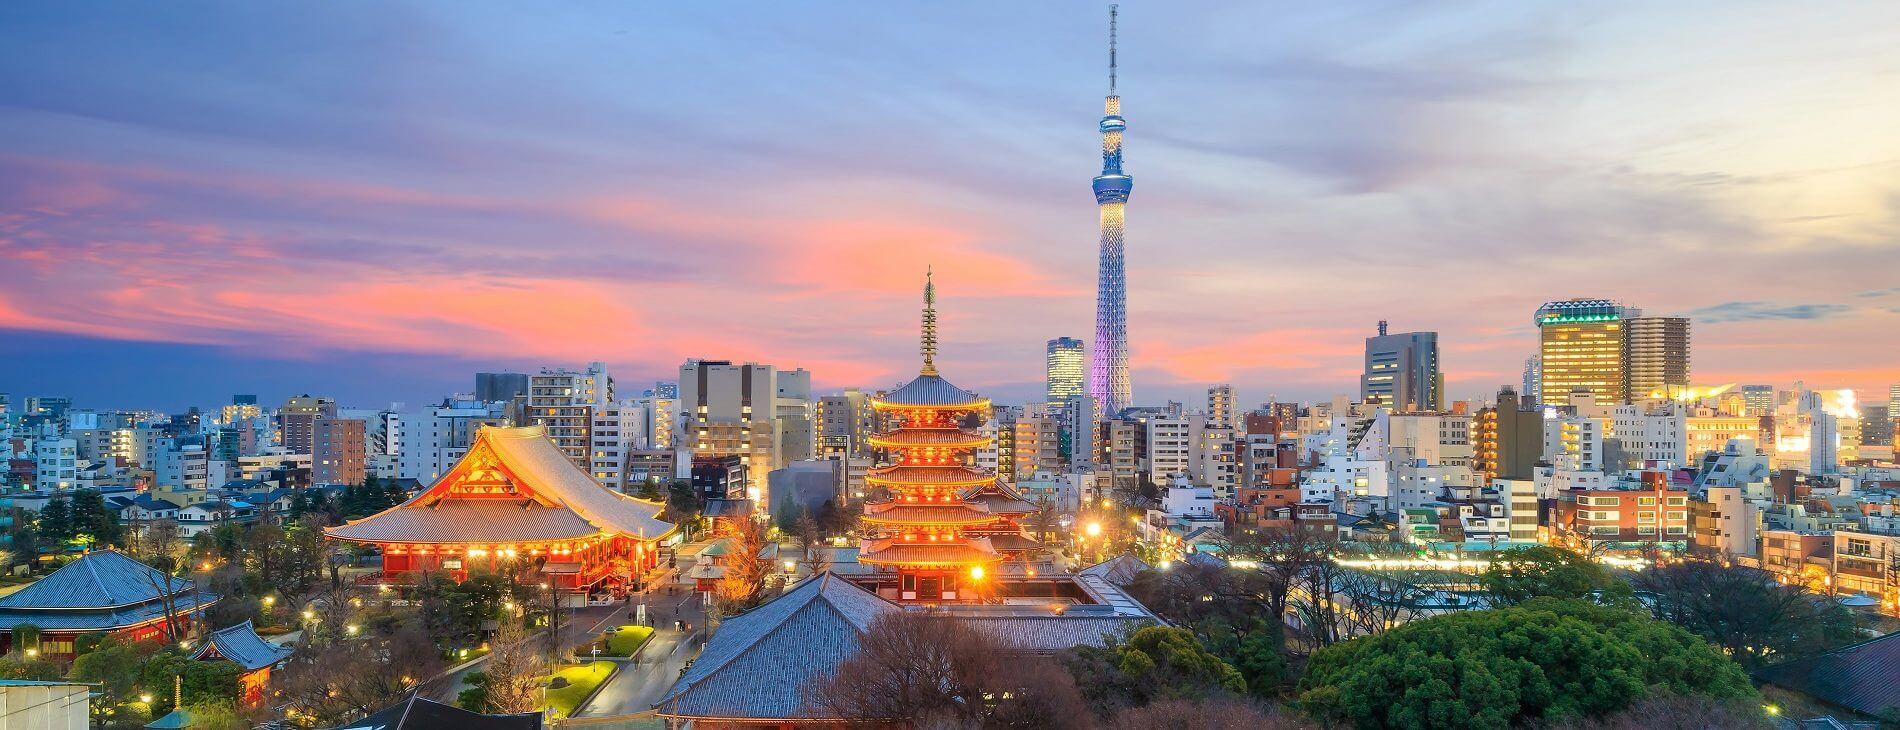 mastroviaggiatore-tokyo-sunset copertina